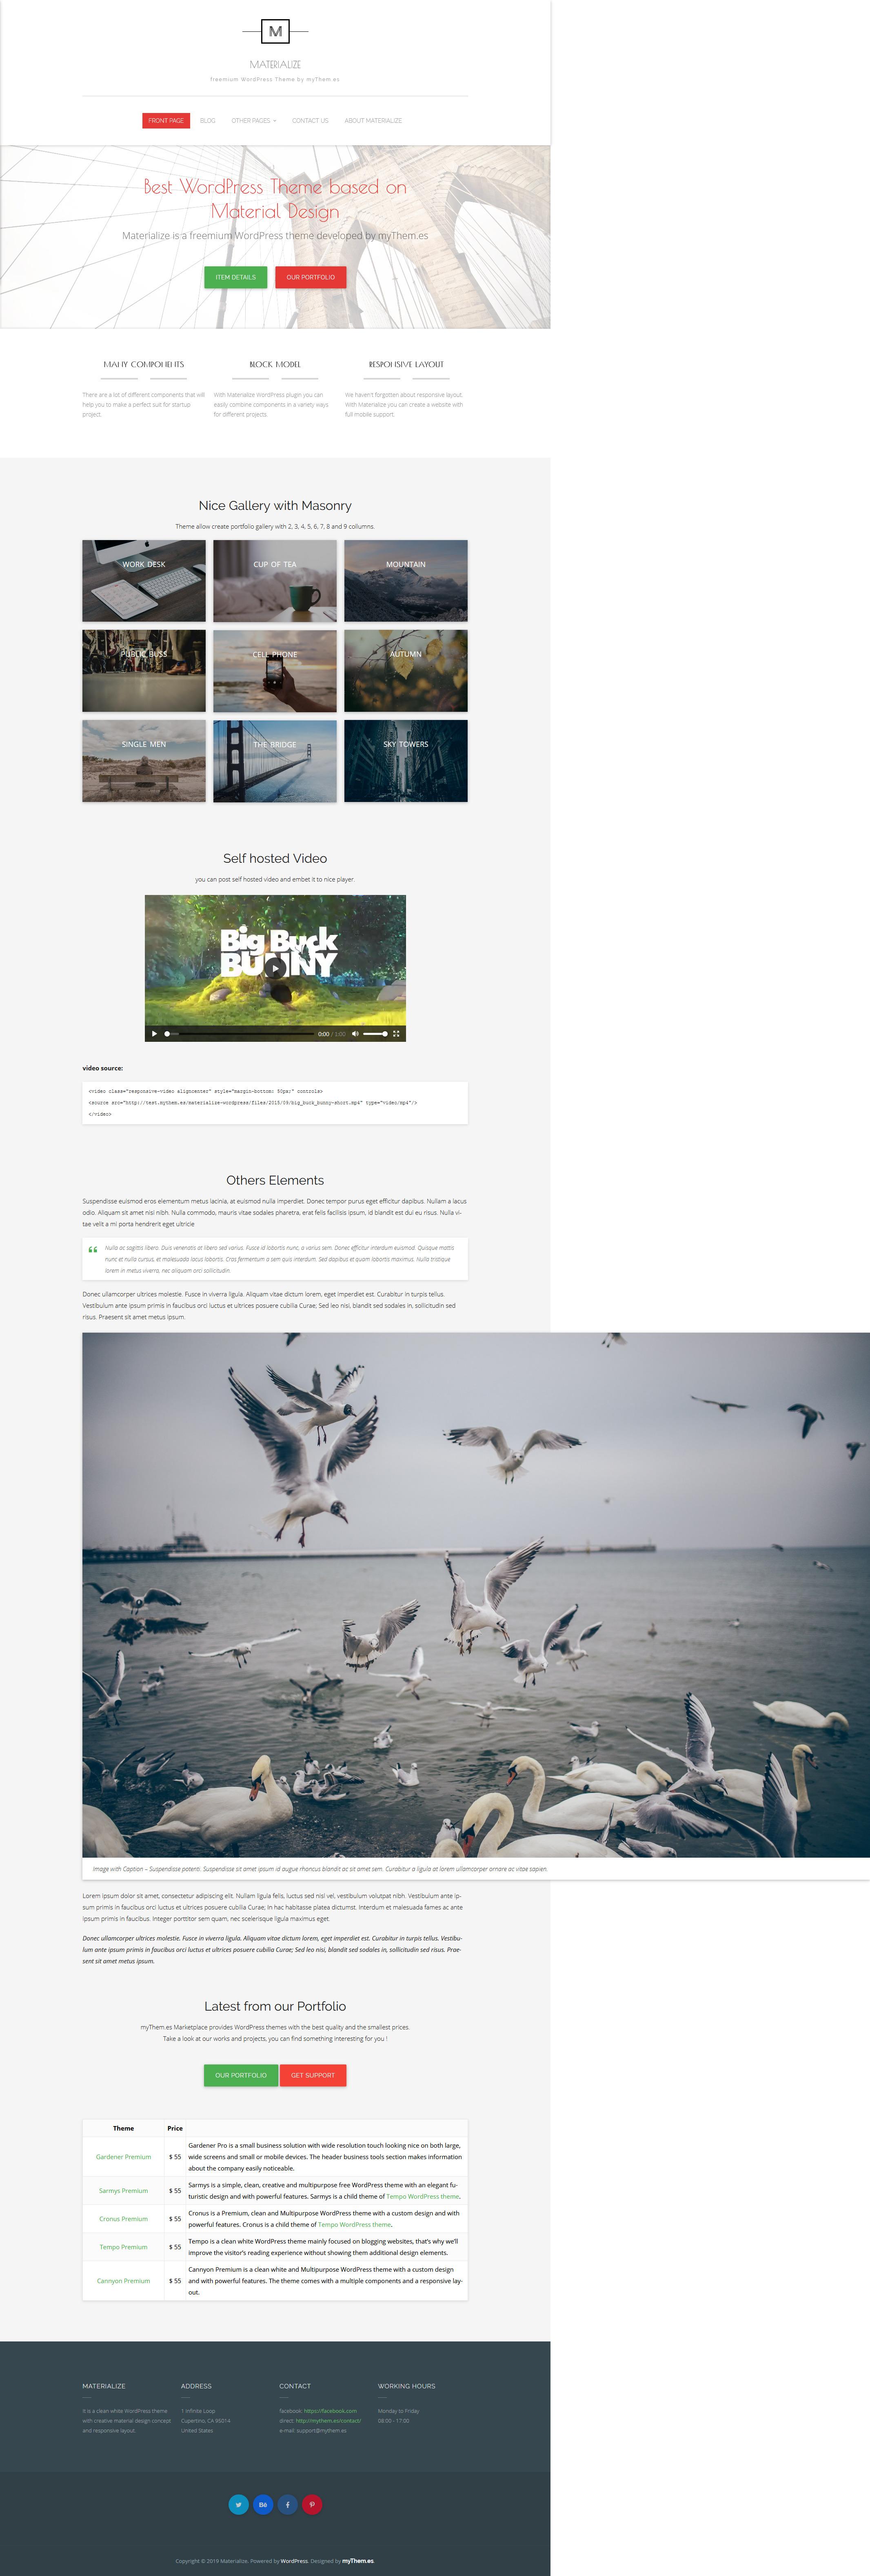 materialize best free science wordpress theme - 10+ Best Free Science WordPress Themes